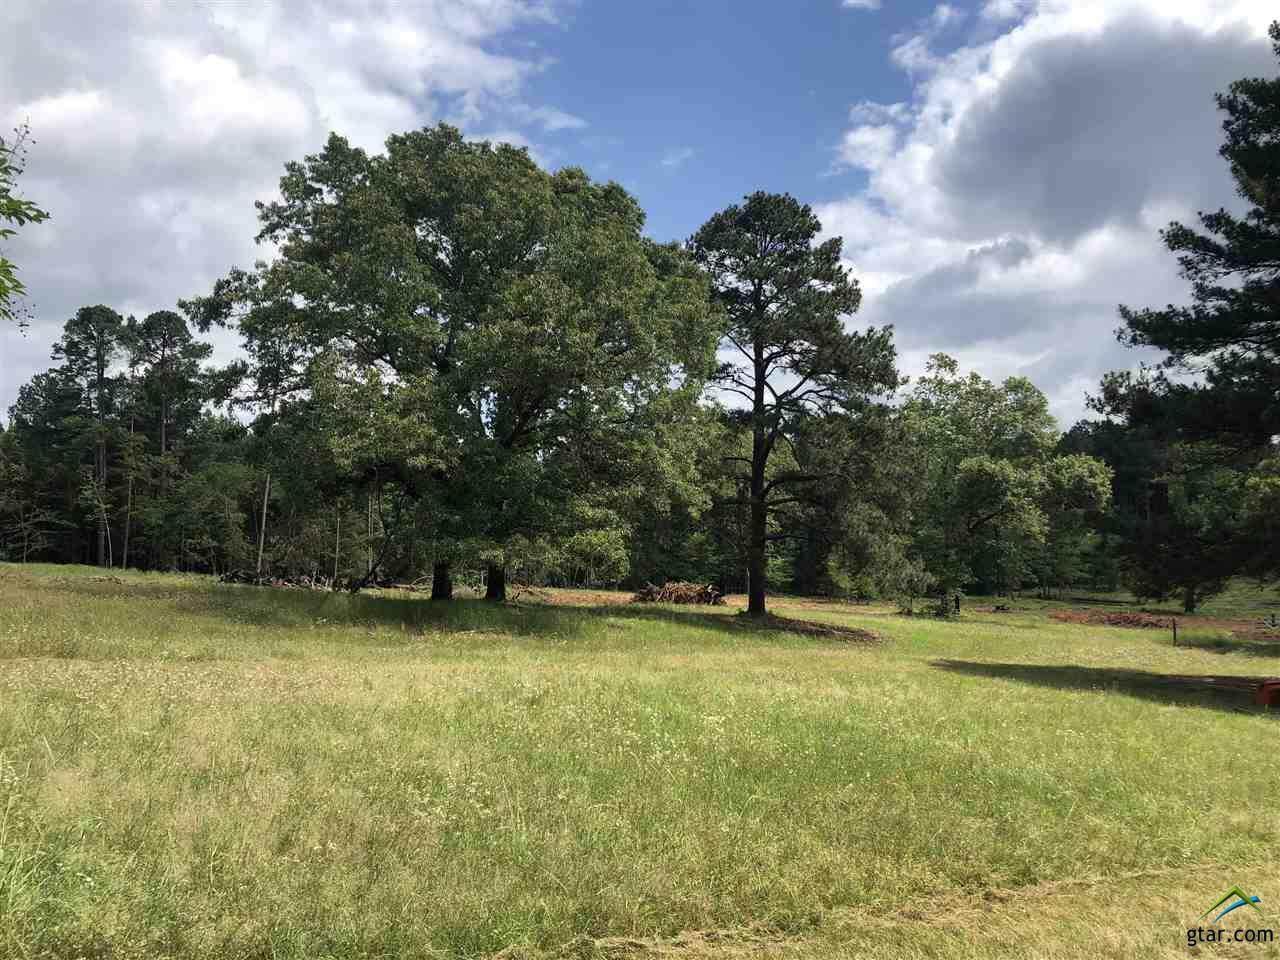 18304 Timber Oaks Dr (Lot 11) - Photo 1